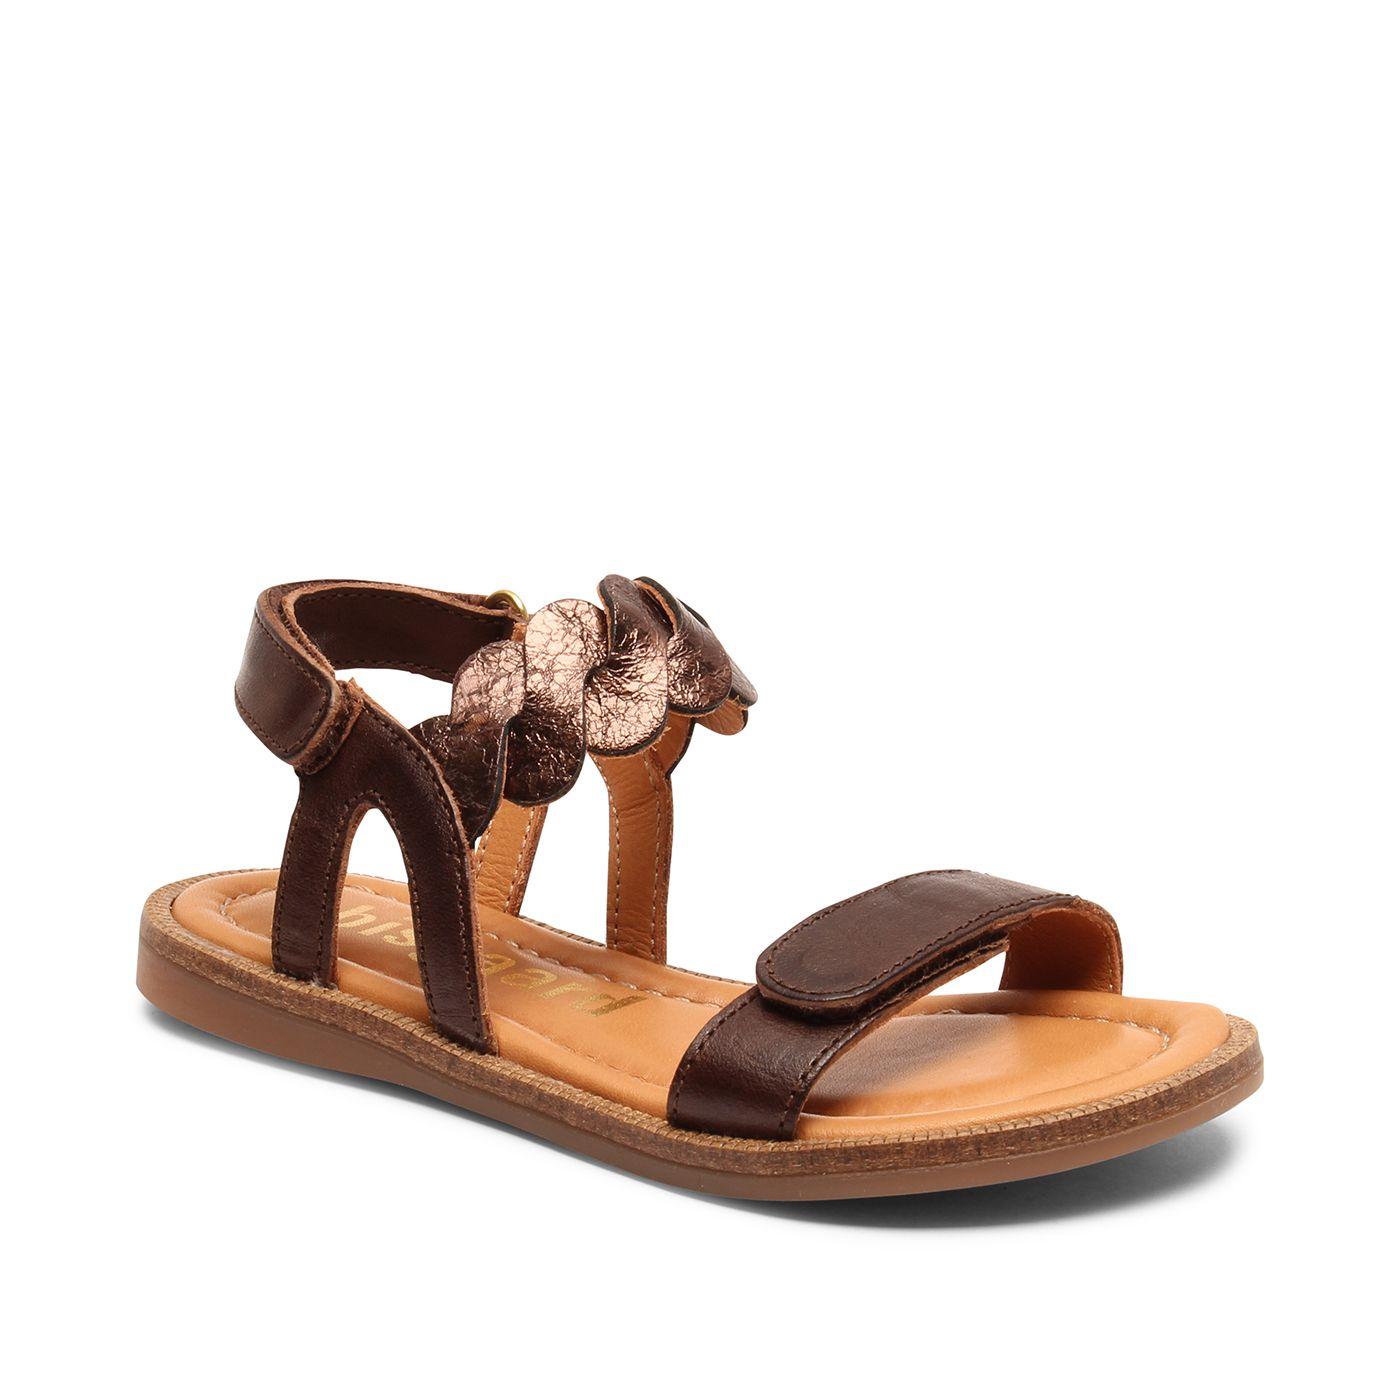 Bisgaard dívčí kožené sandály 71945 - 1200